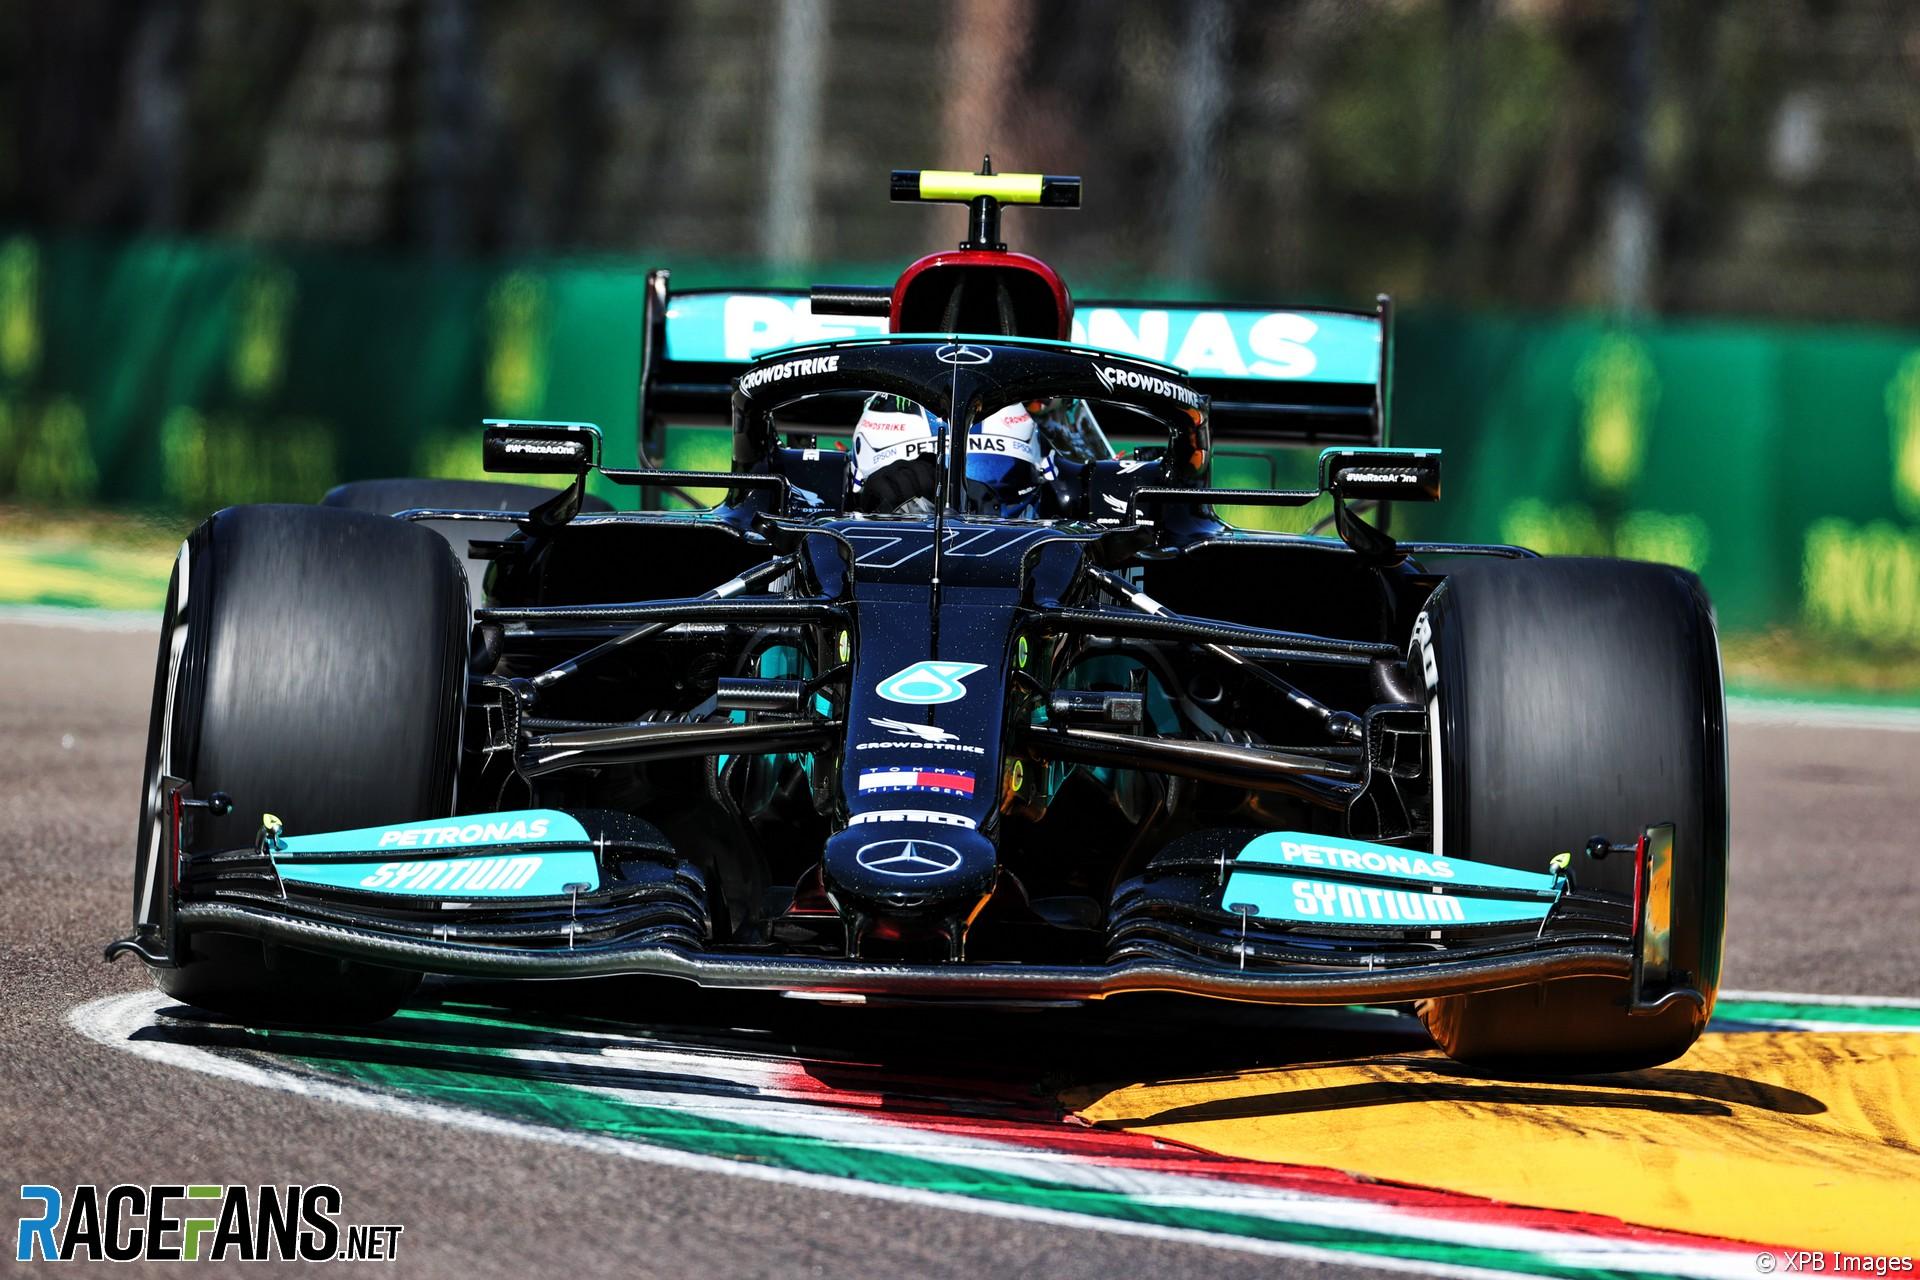 Valtteri Bottas, Mercedes, Imola, 2021